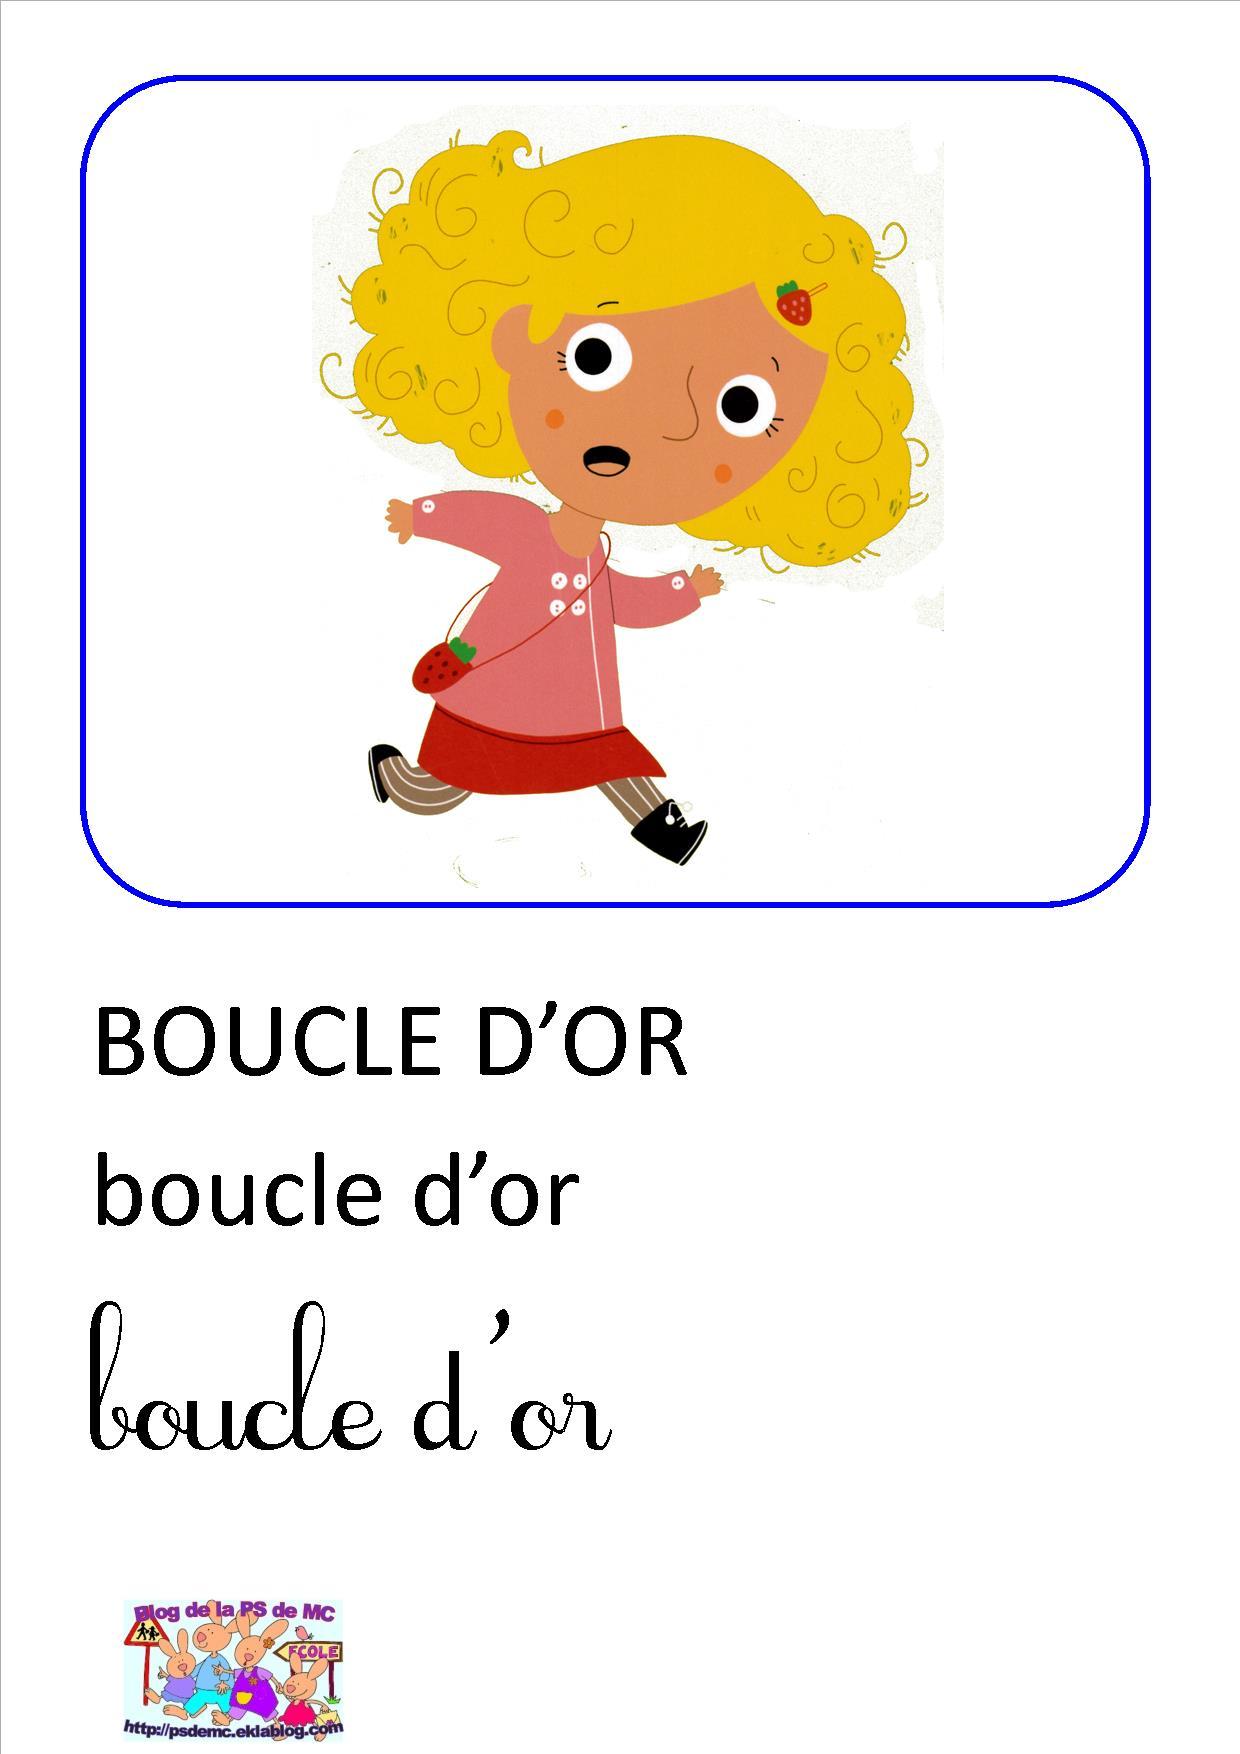 Histoire De Boucle D Or : histoire, boucle, Boucle, Imagier, Maternelle